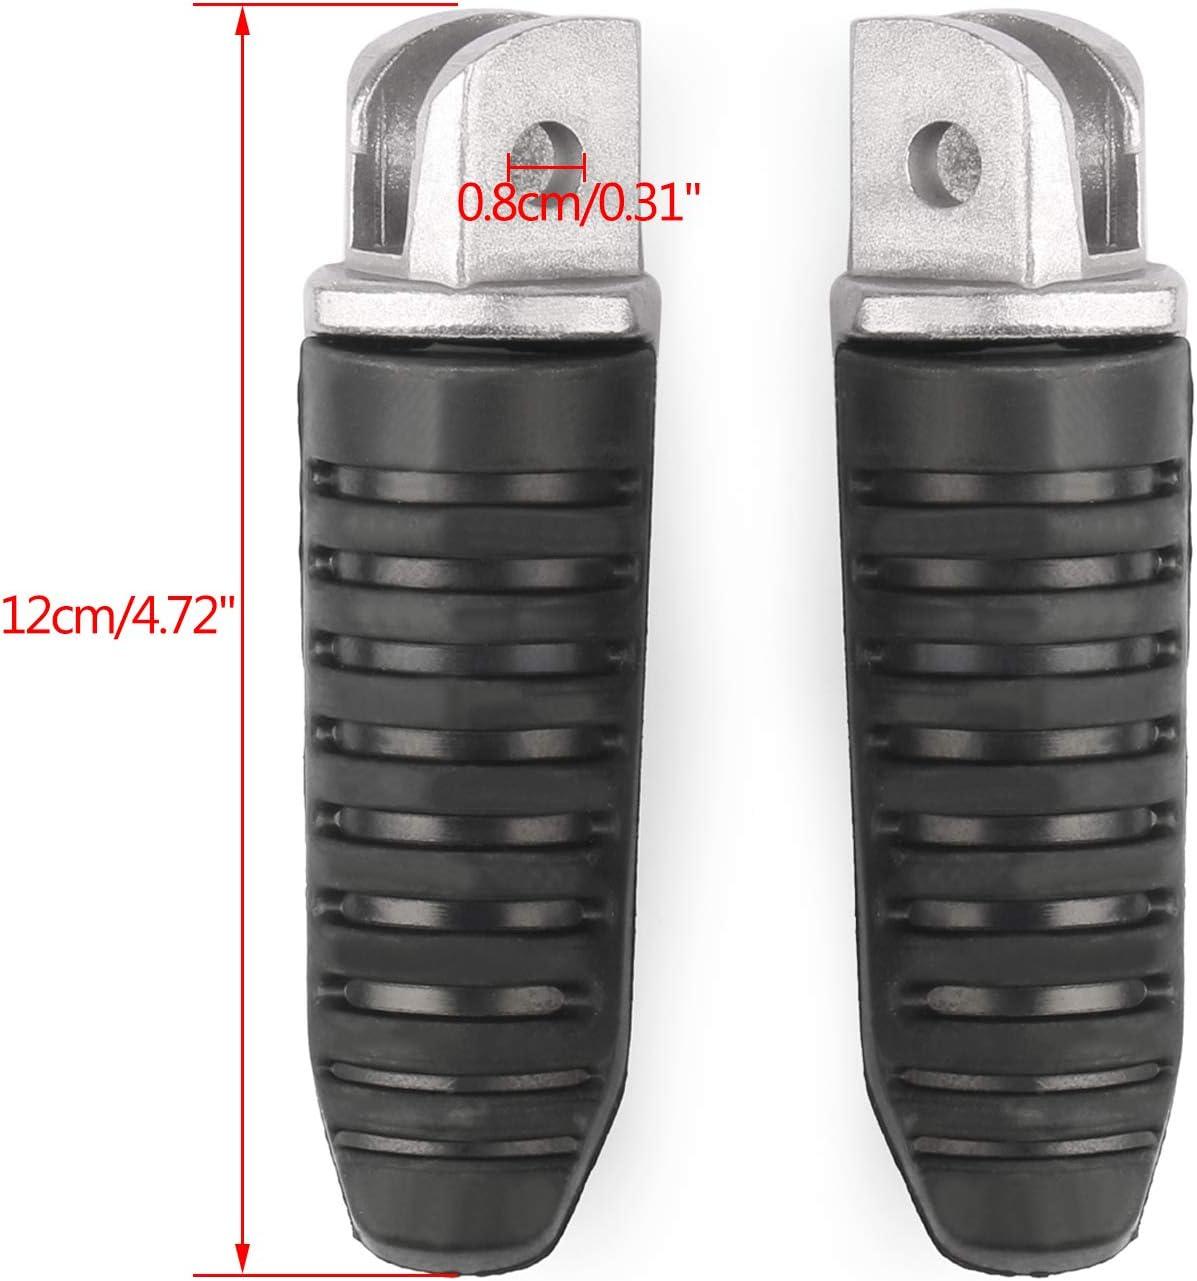 Avant P/édale Moto Repose Pied Footrest Footpeg pour S-U-Z-U-K-I V-Strom DL 650 GSX 1250 1300 GSR 600 Artudatech Repose-pieds